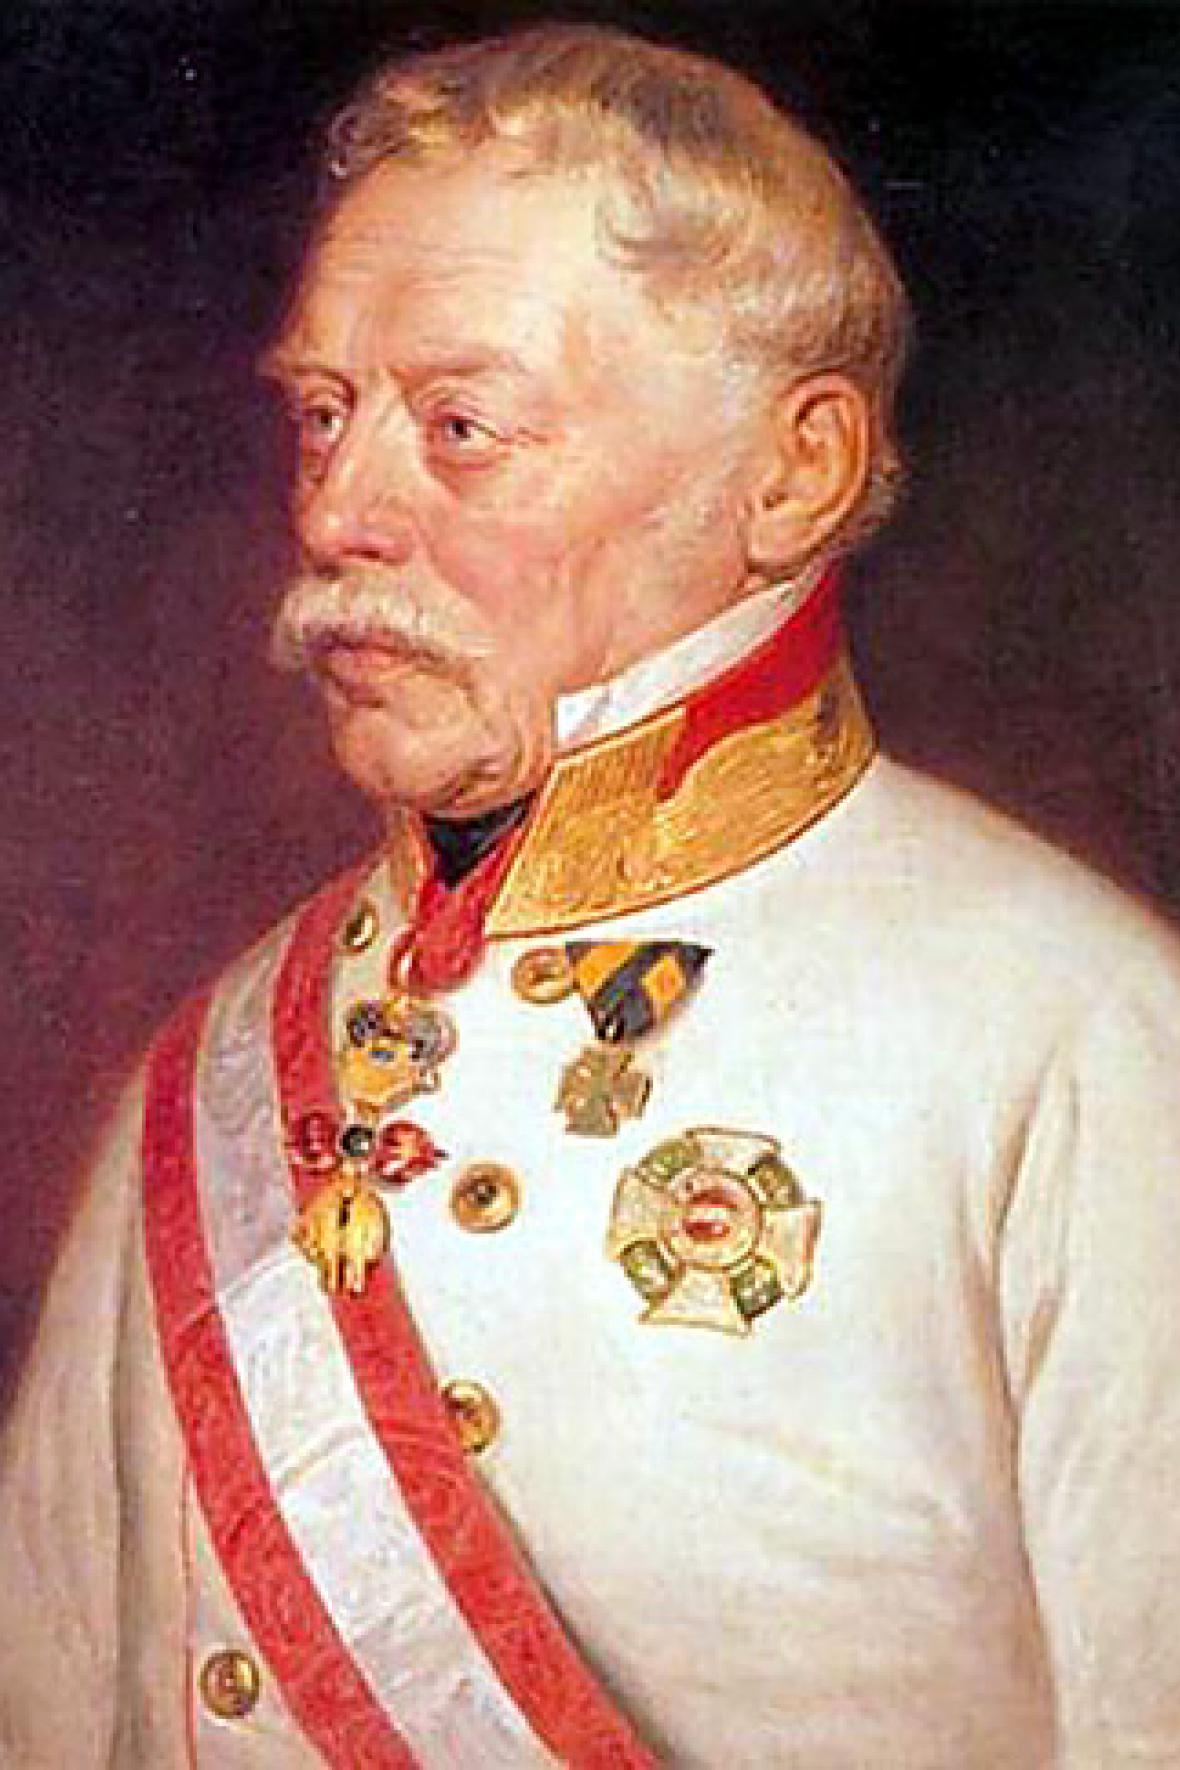 Jan Josef Václav hrabě Radecký z Radče